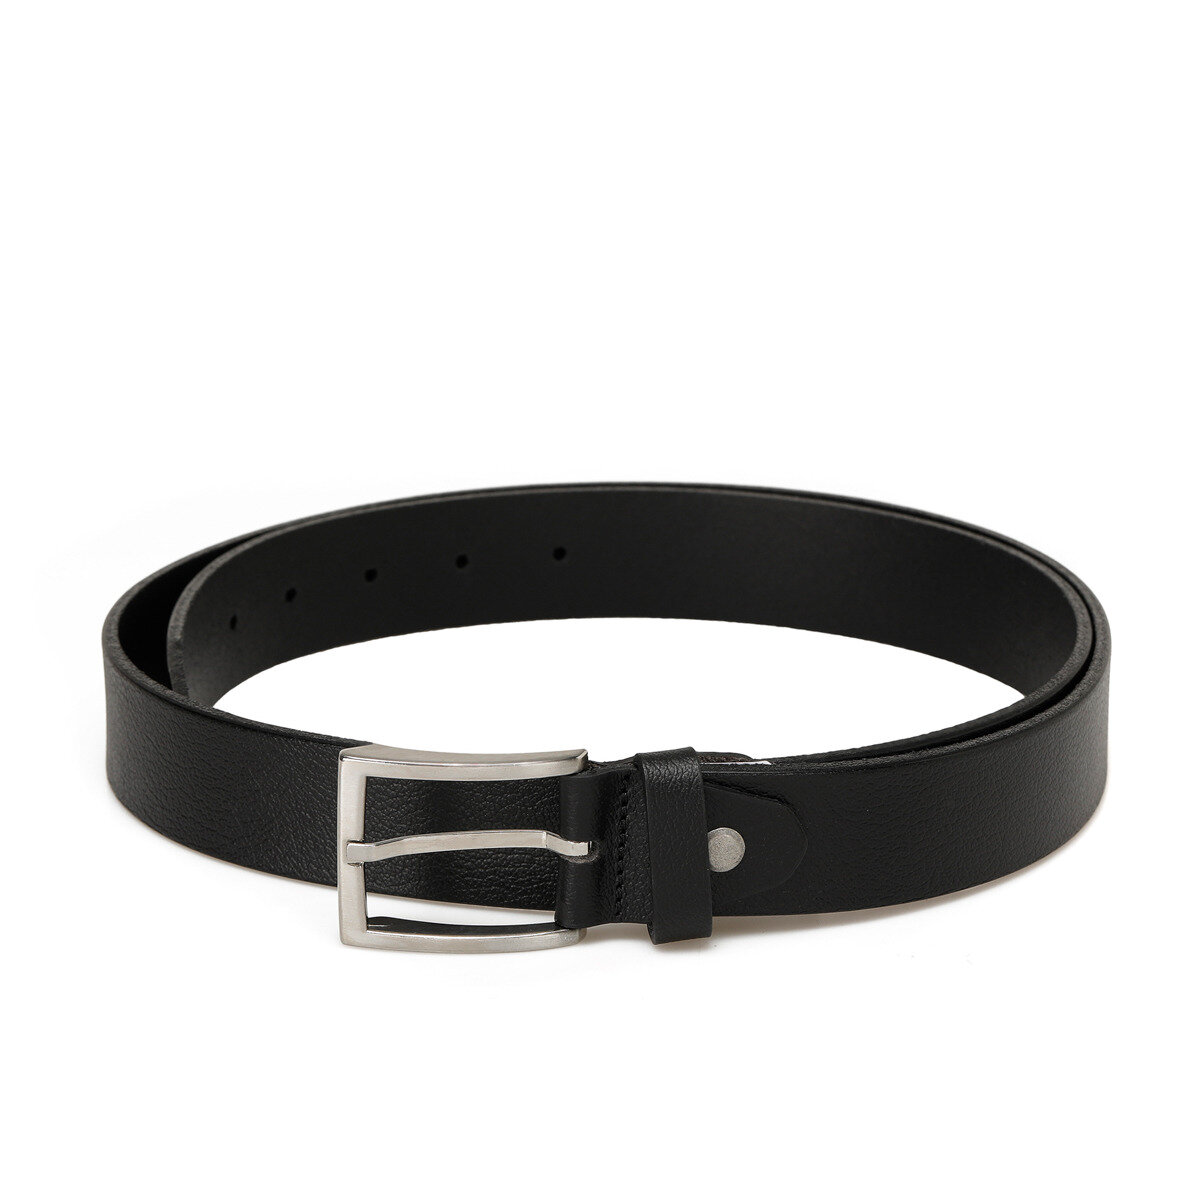 FLO 20M KLT LEATHER KMR Black Male Belt Garamond